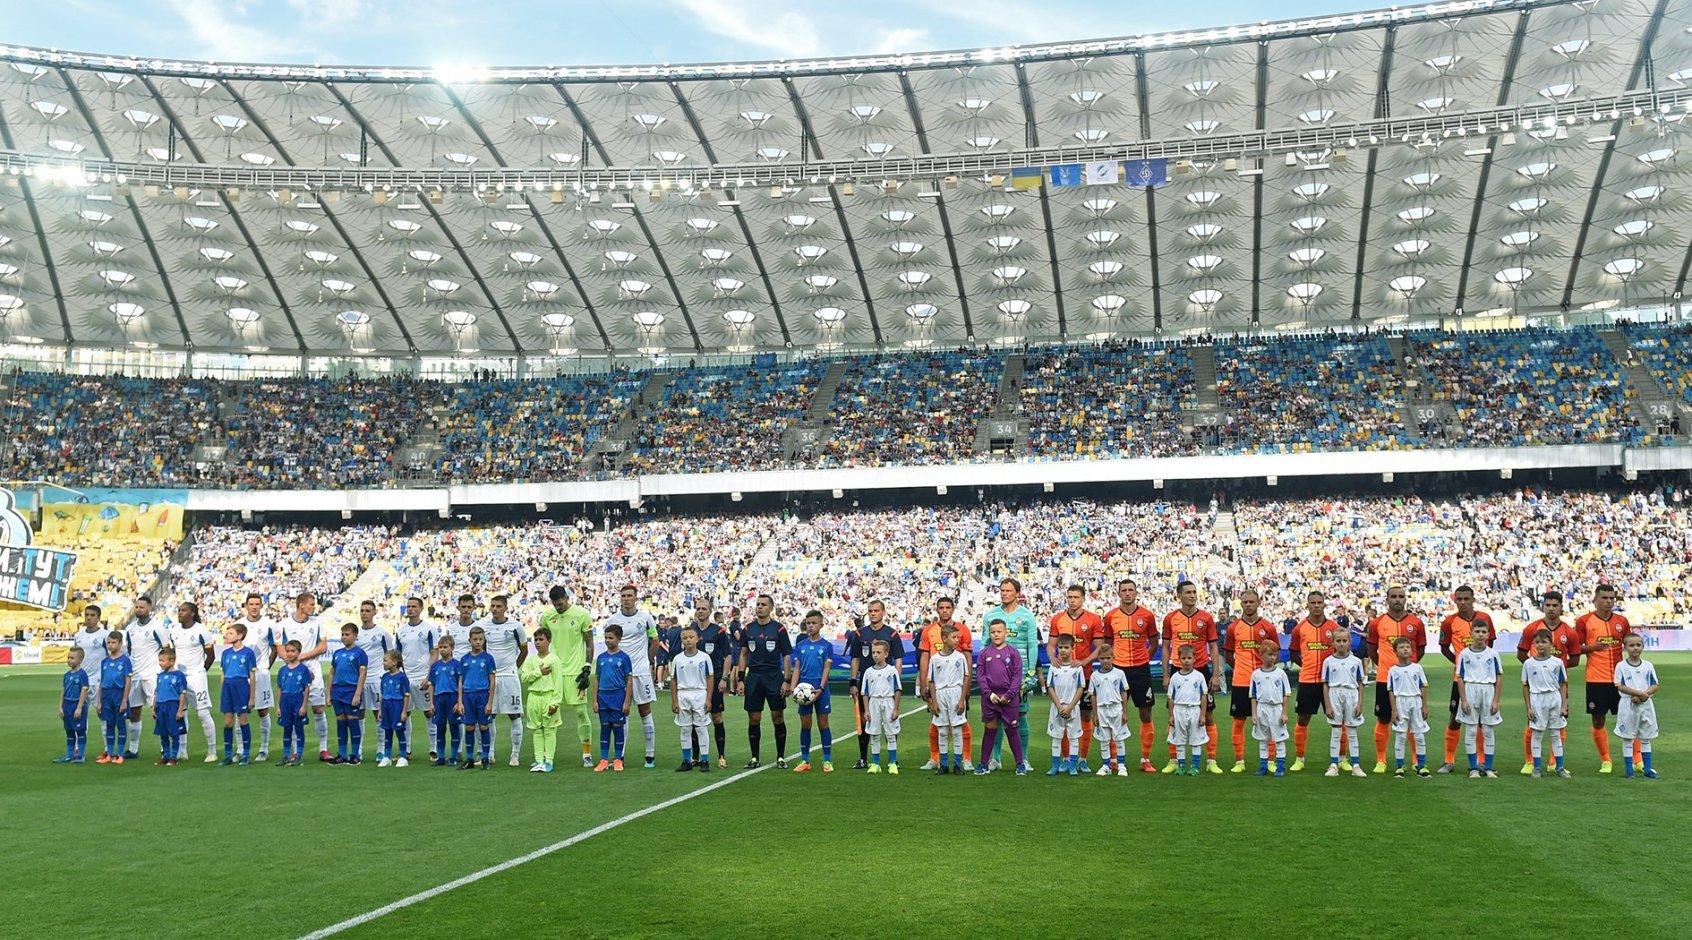 Где и как ходят на футбол: вишенка на киевском торте и рух по-львовски